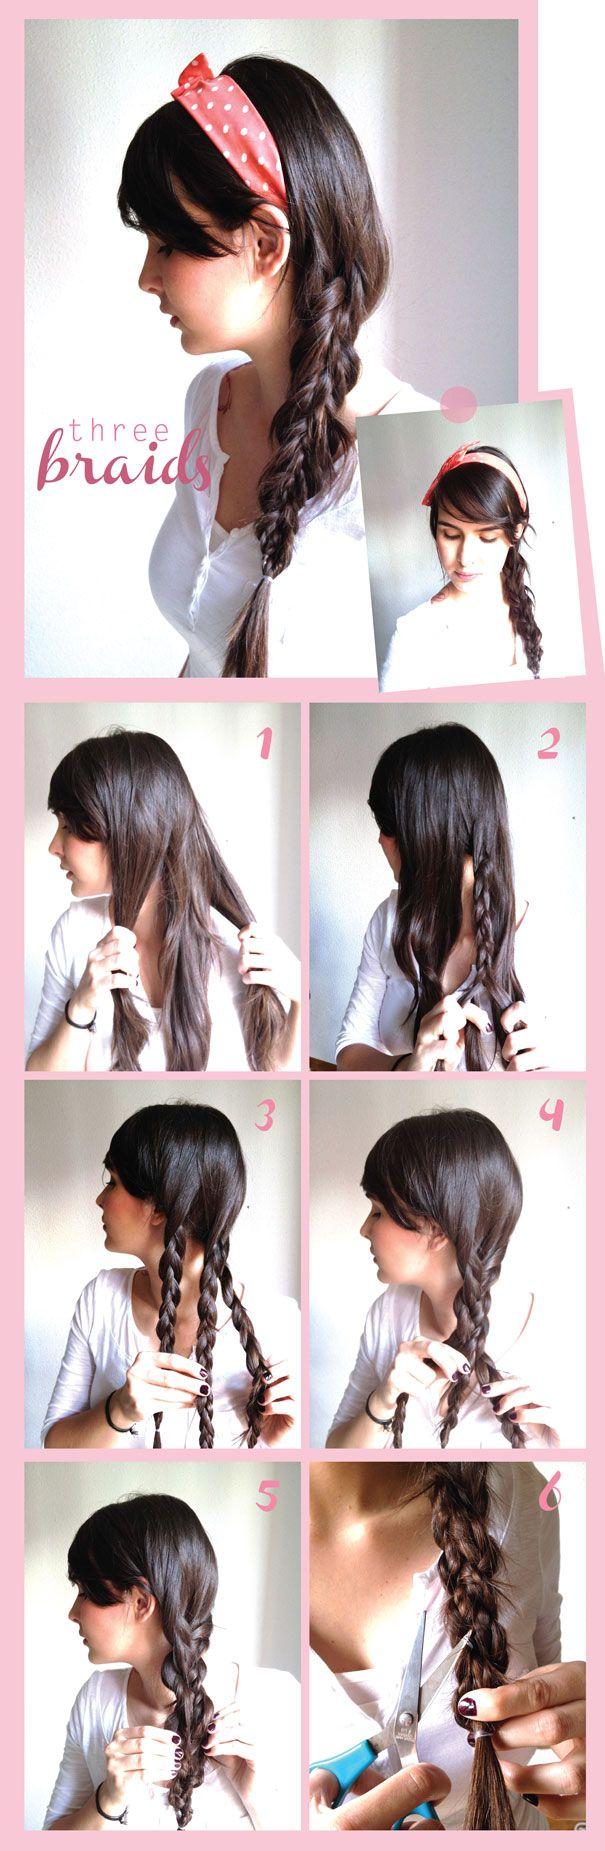 Braided hairstyle tutorial ponytail kenra professional